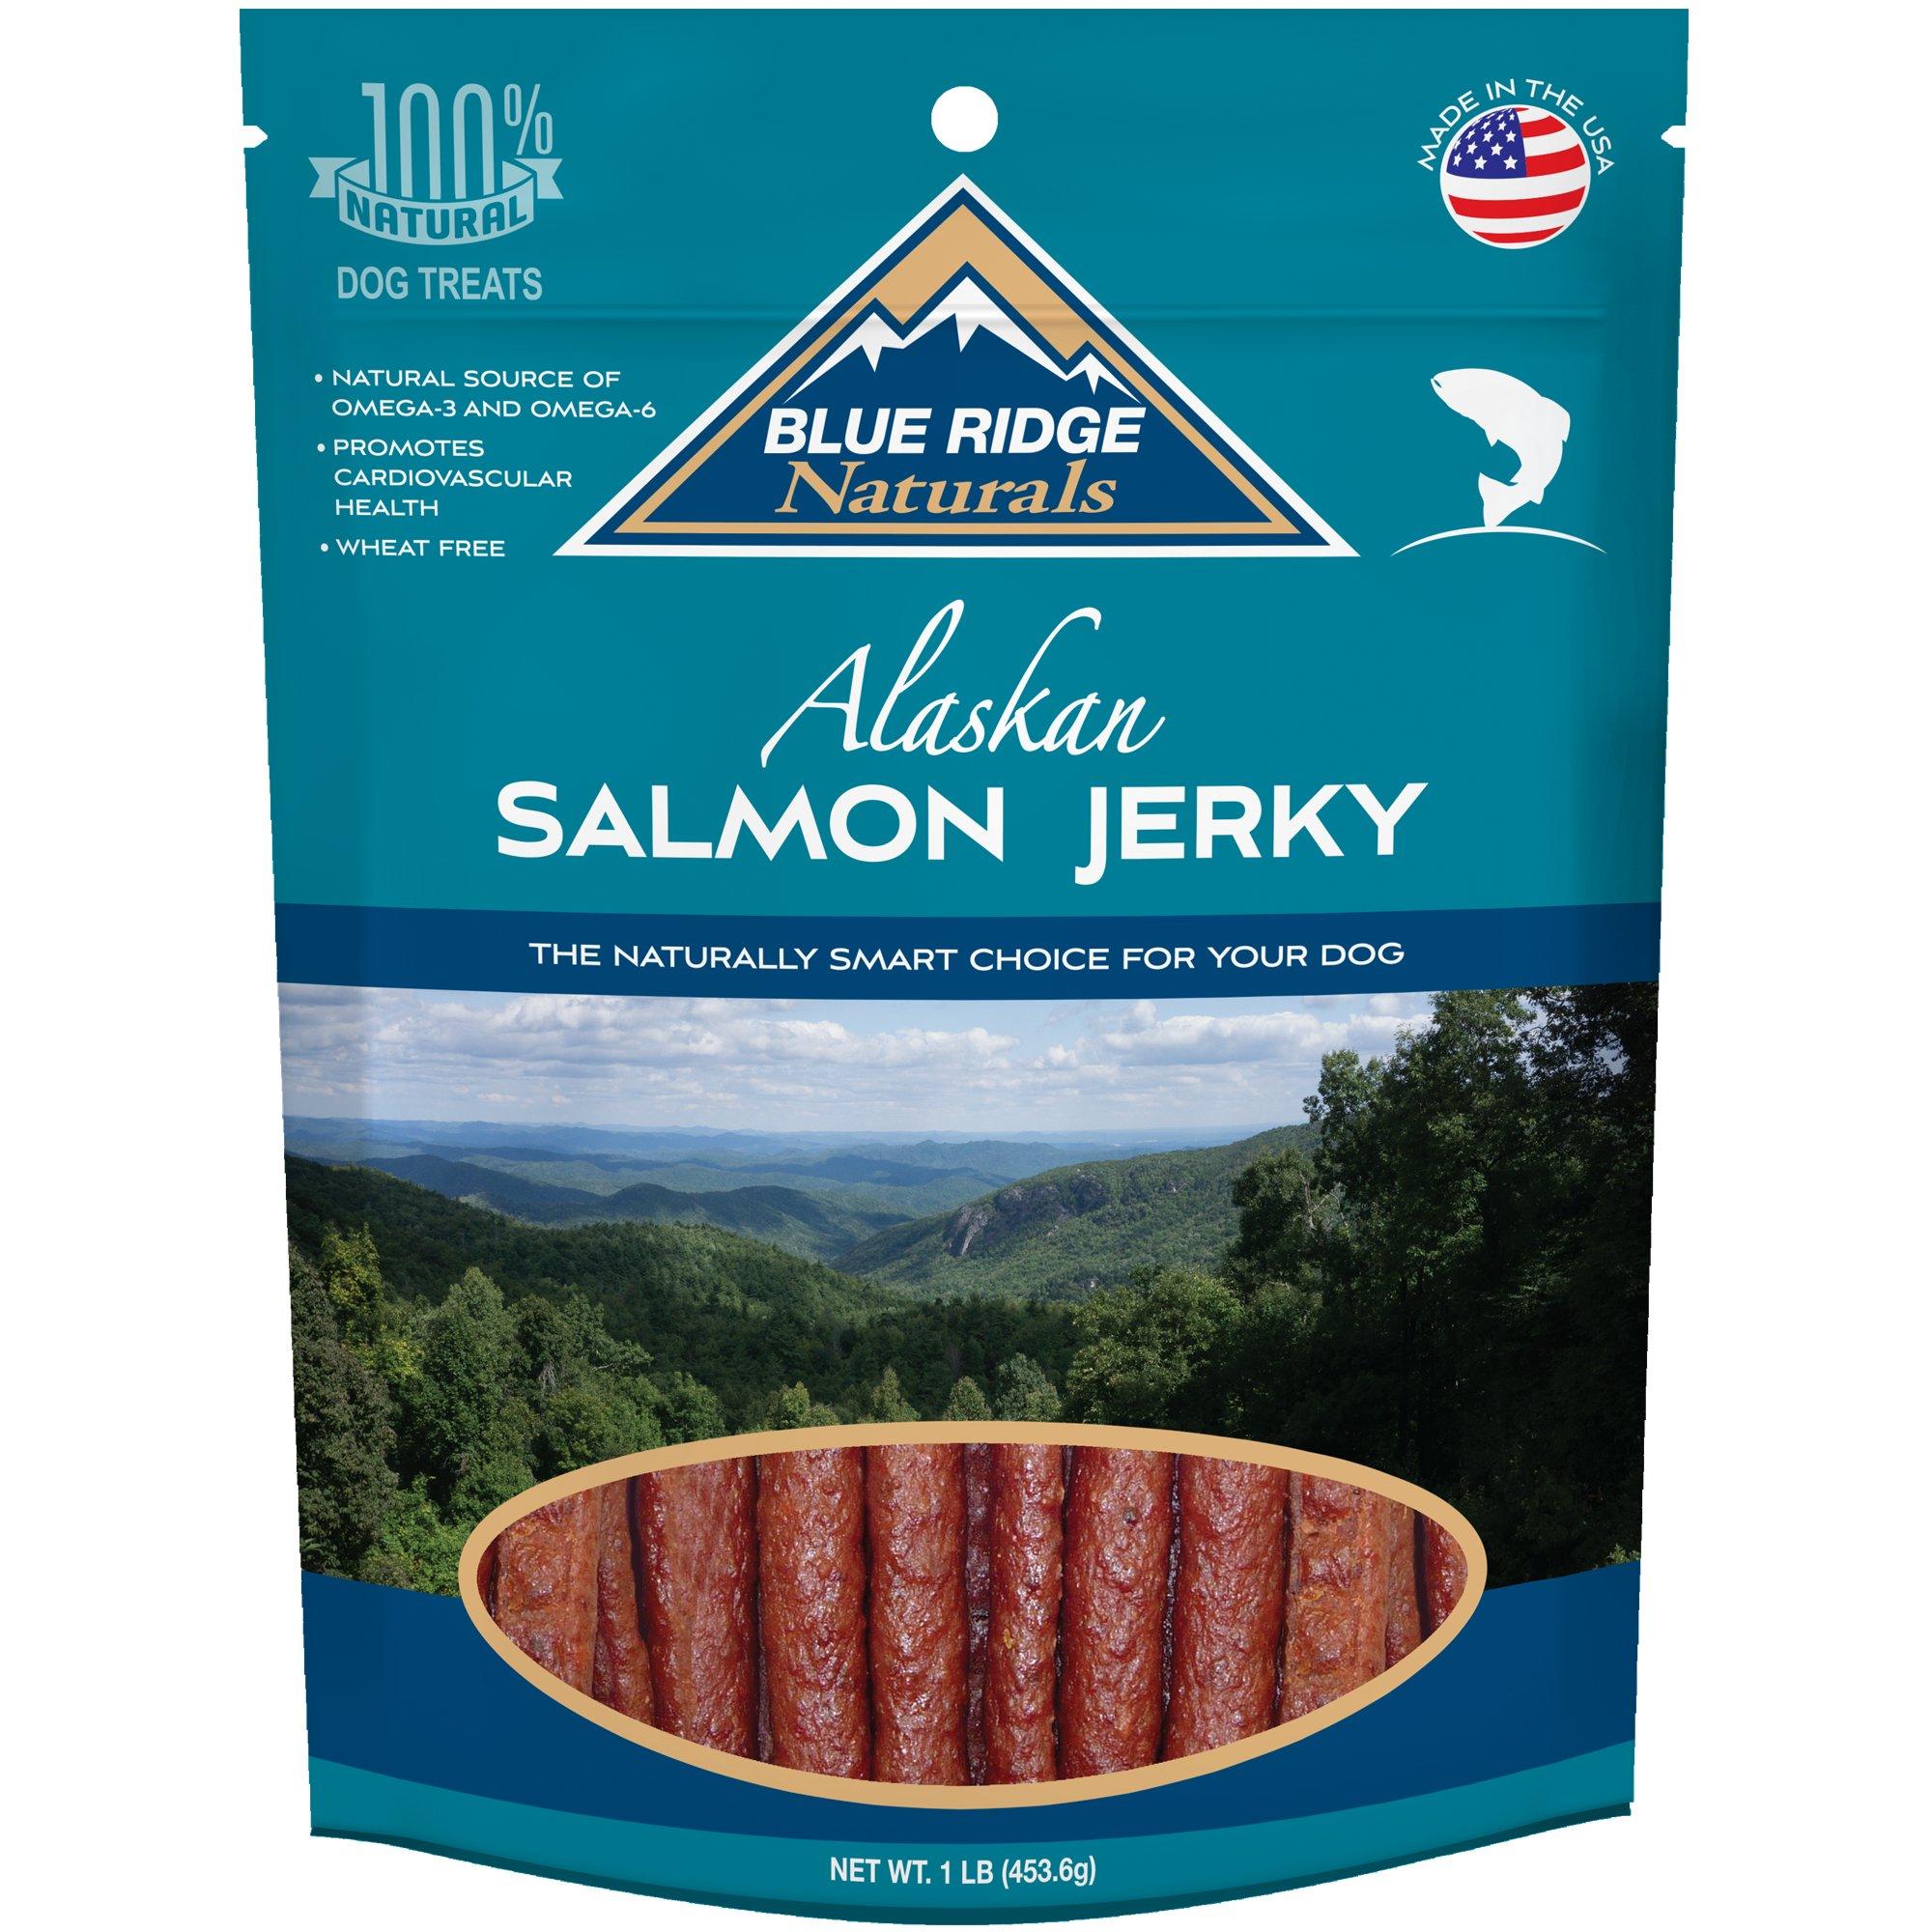 Blue Ridge Naturals Oven Baked Salmon Jerky Dog Treats